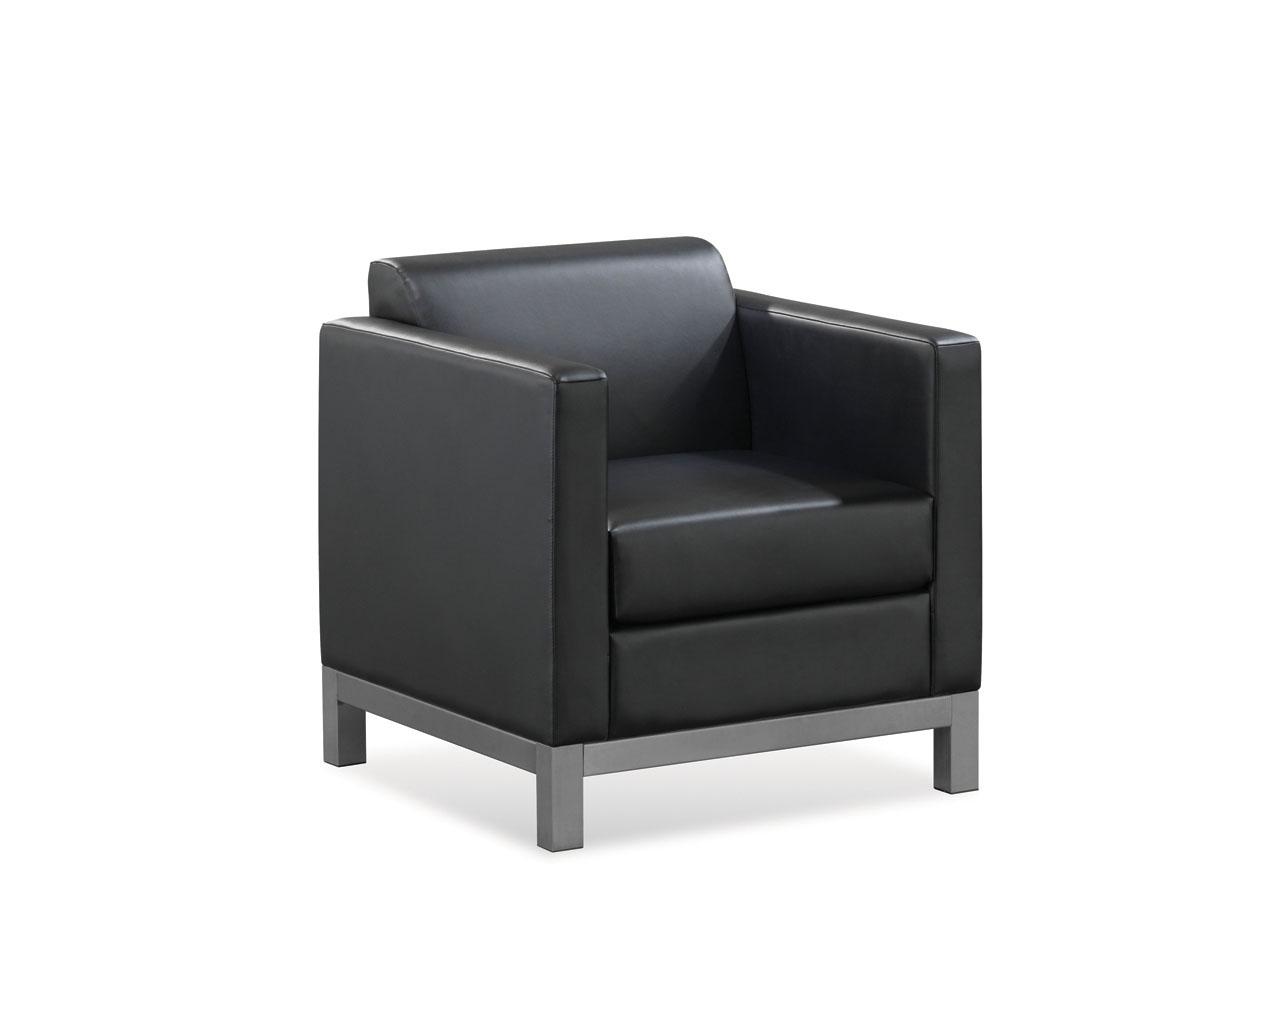 Compose Modular Reception Seating